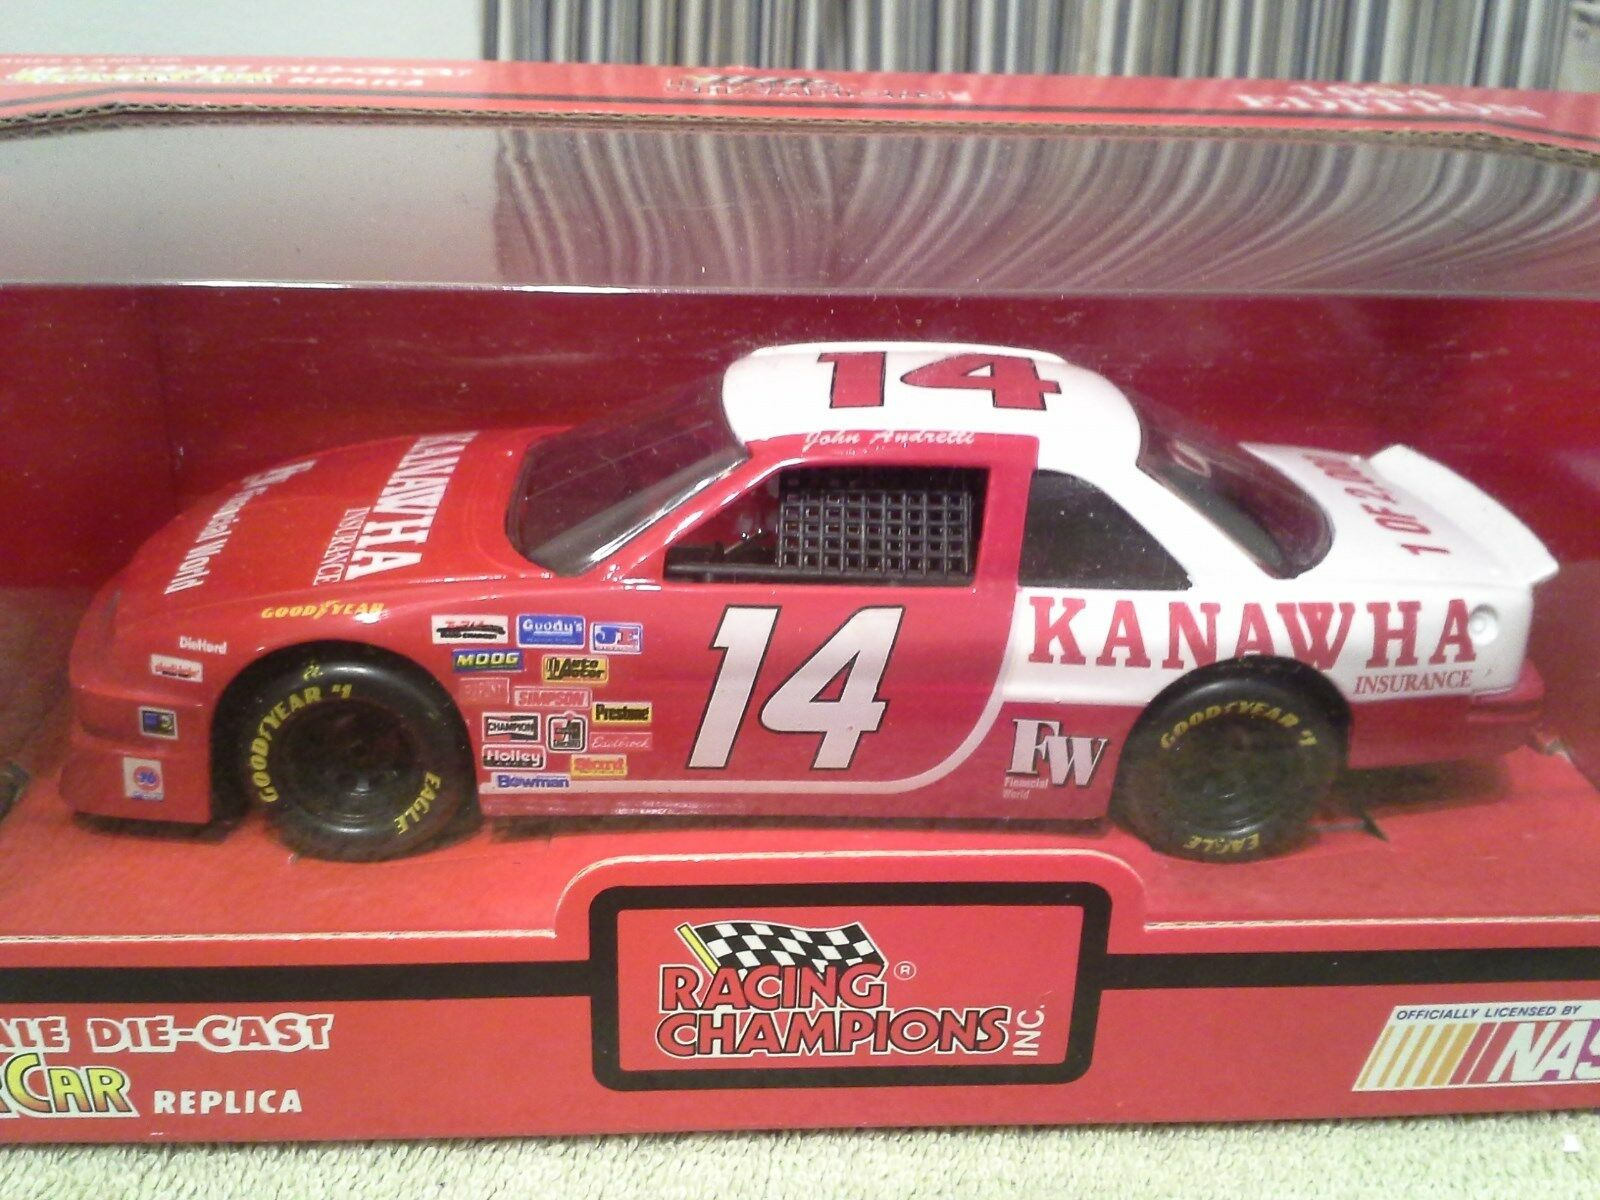 1994 Racing Champions JOHN ANDRETTI Kanawha Insurance Nascar  24 Diecast